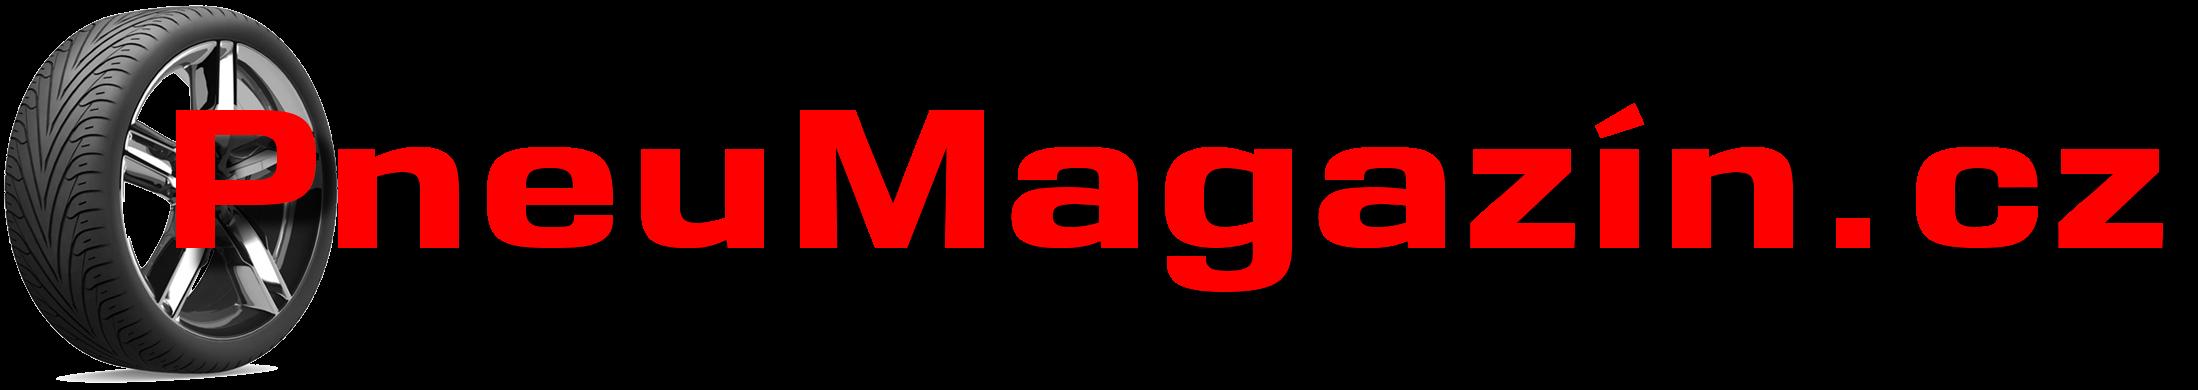 logo pneumagazin.cz